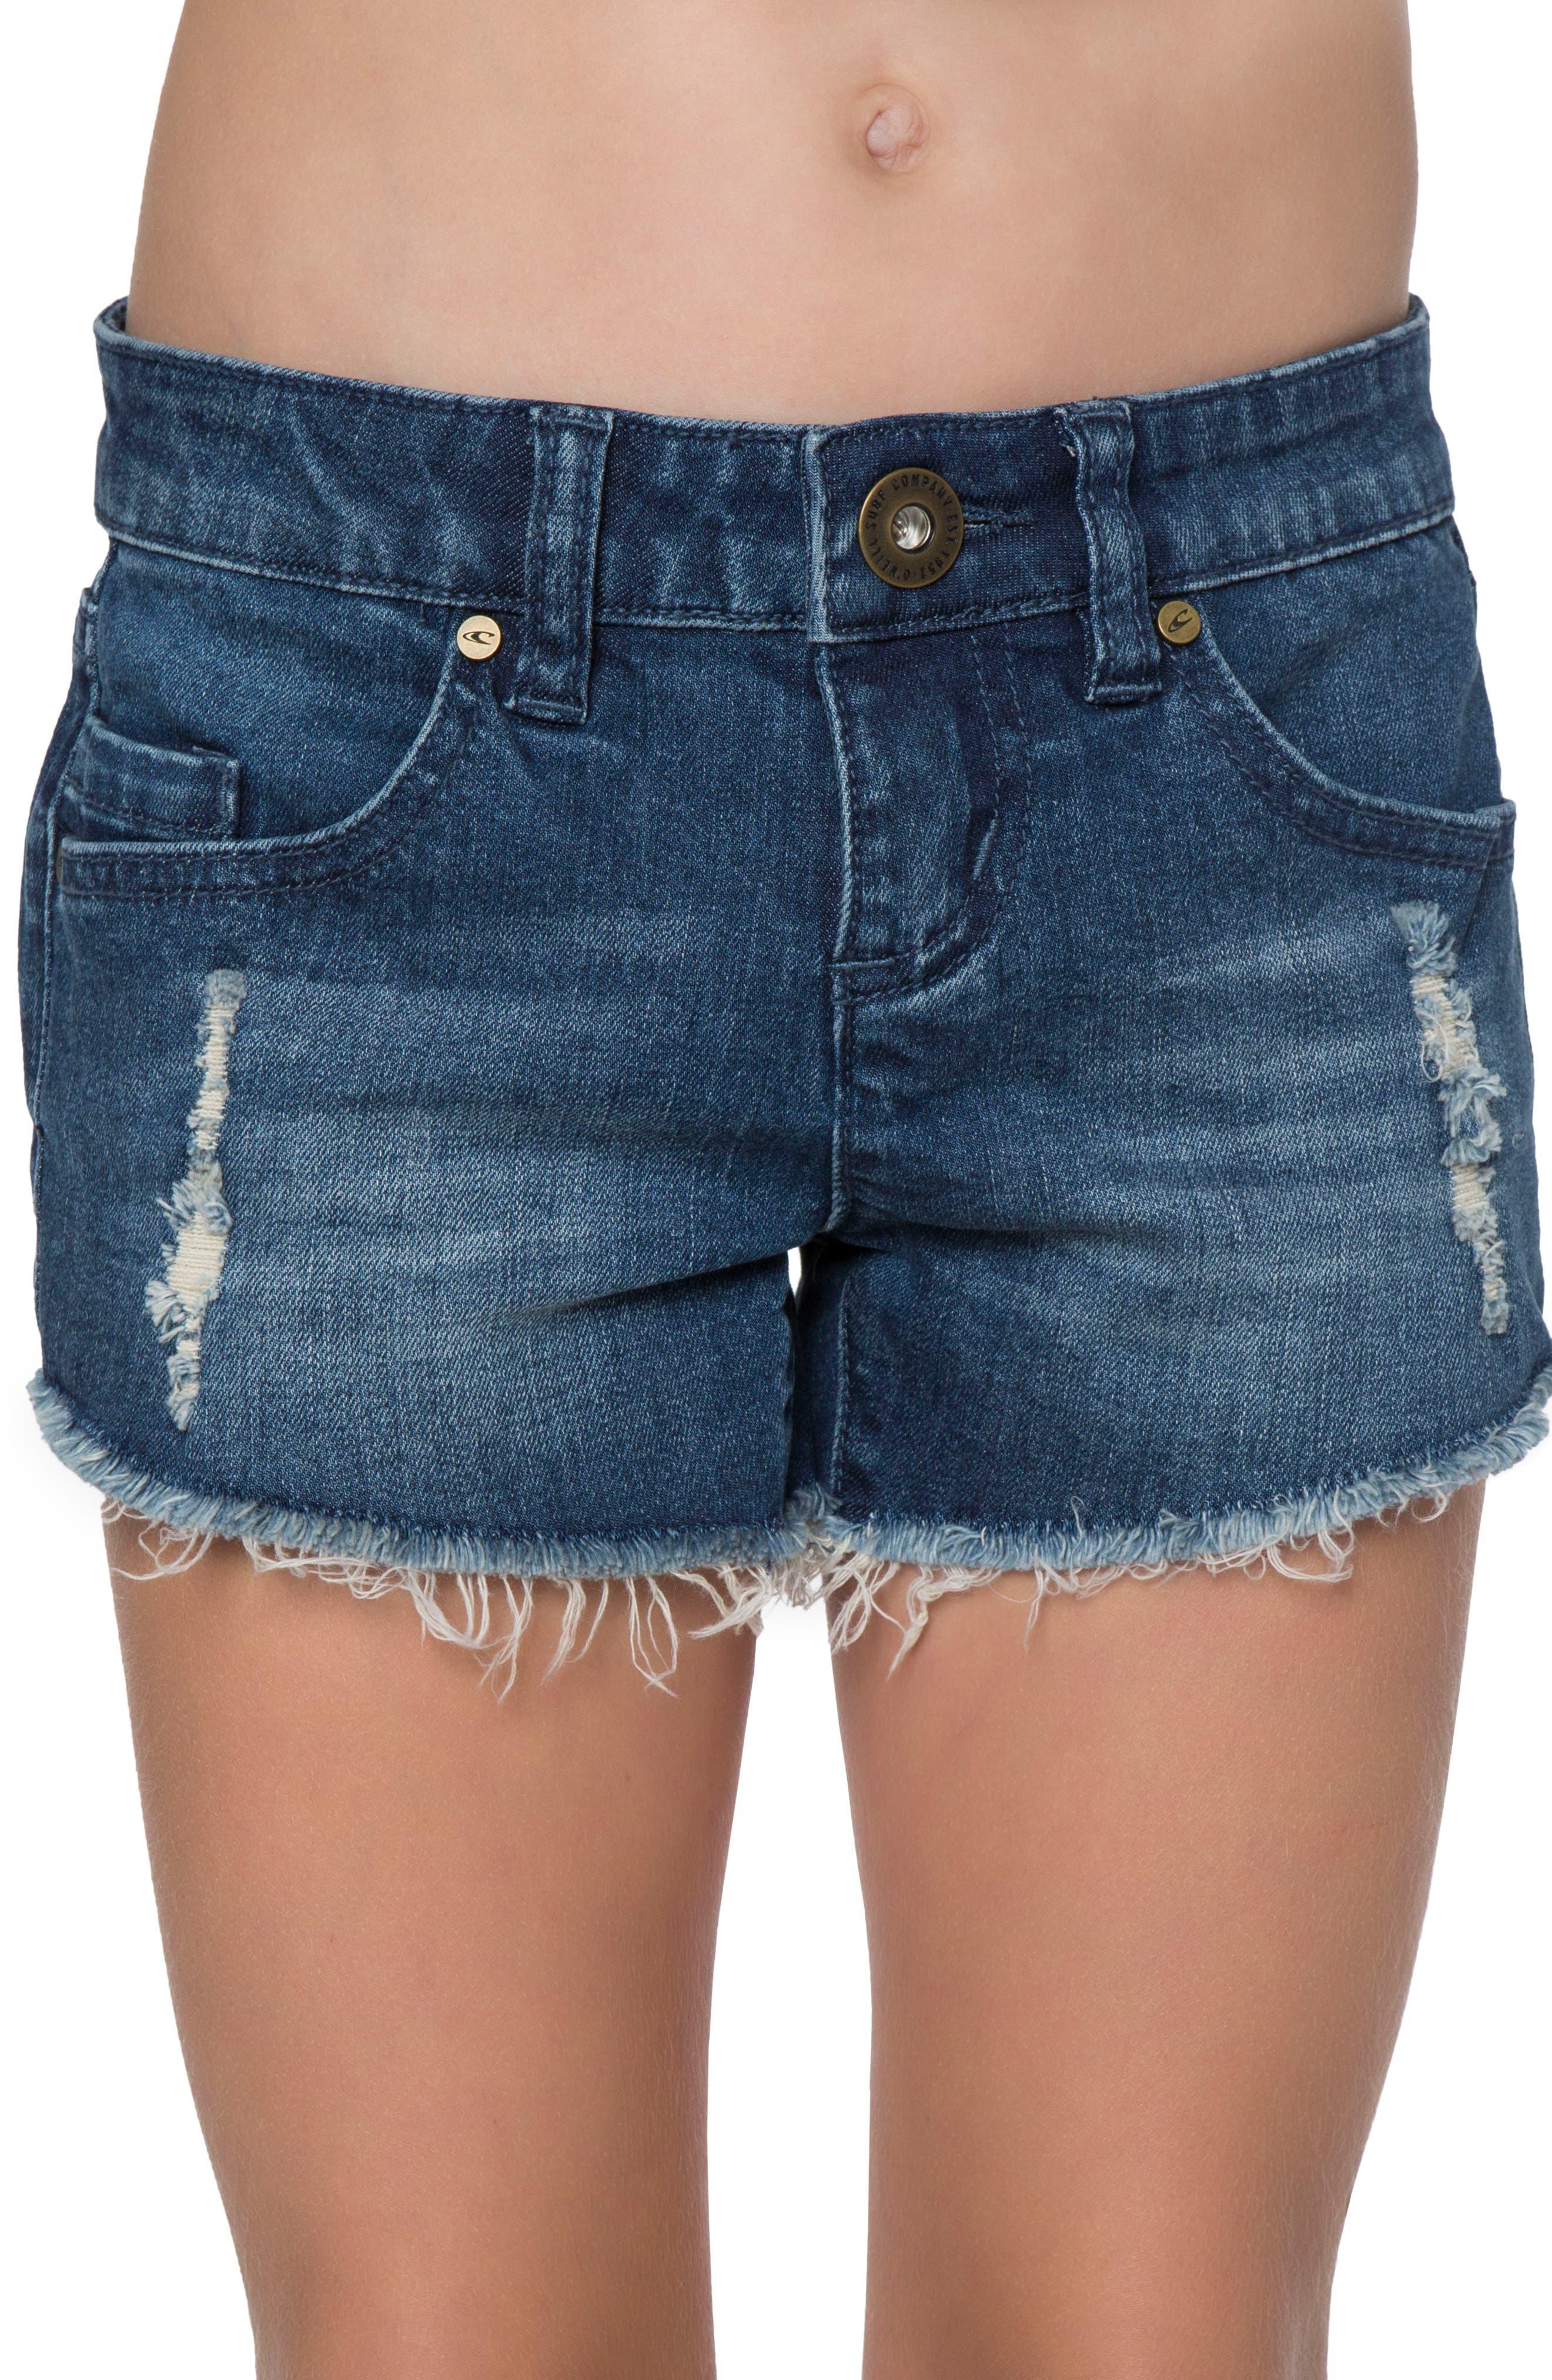 Alternate Image 1 Selected - O'Neill Camper Denim Shorts (Big Girls)